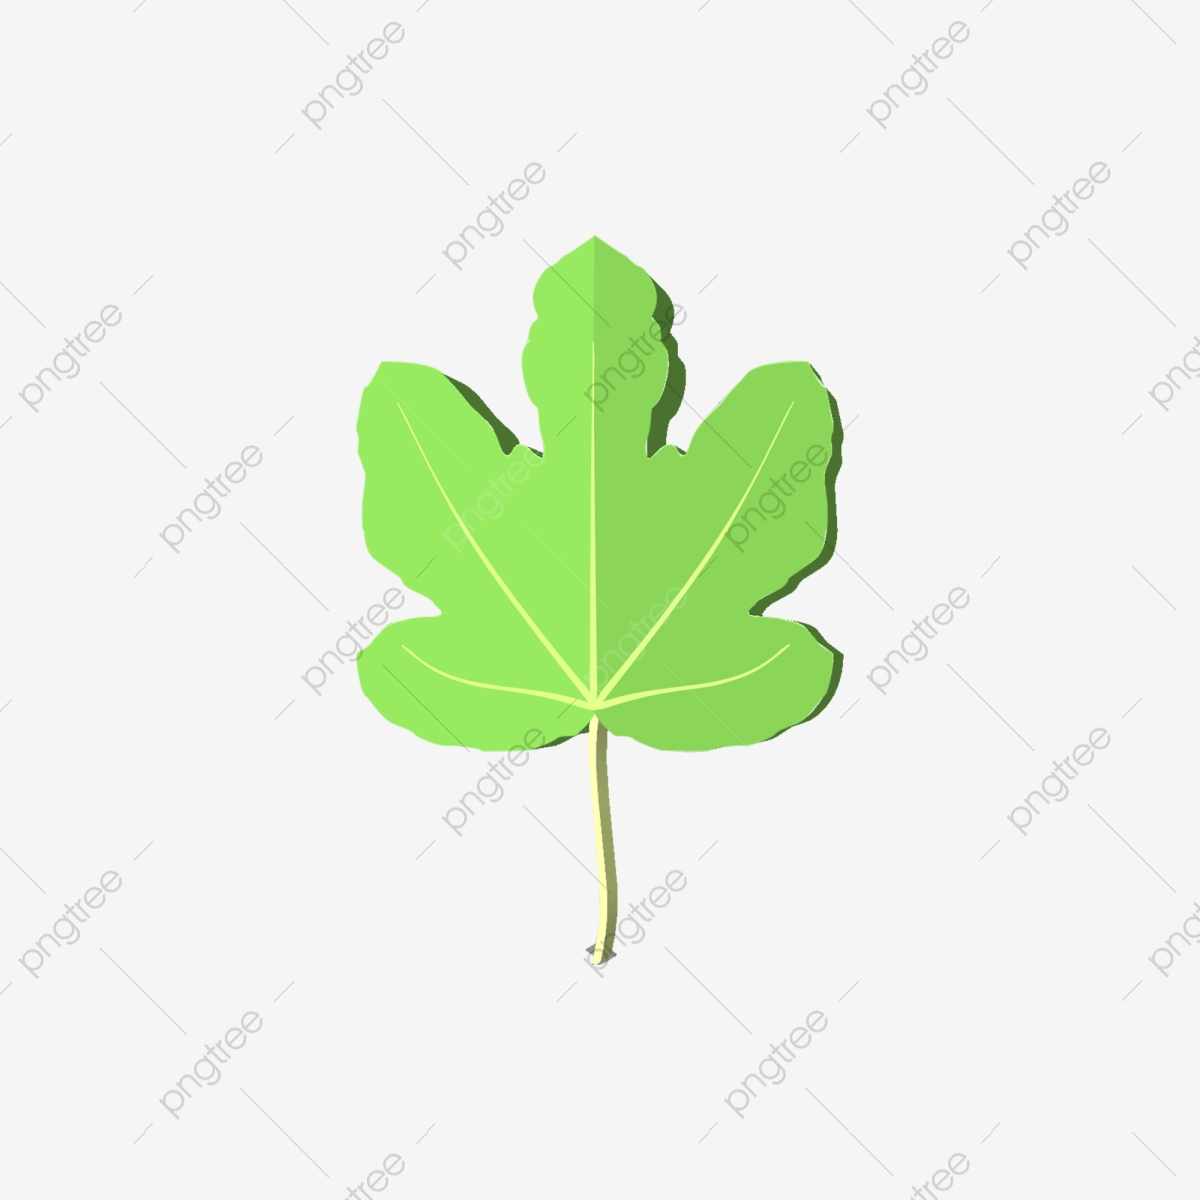 3d Style Cartoon Minimalistic Plant Decorative Green Leaves, Green